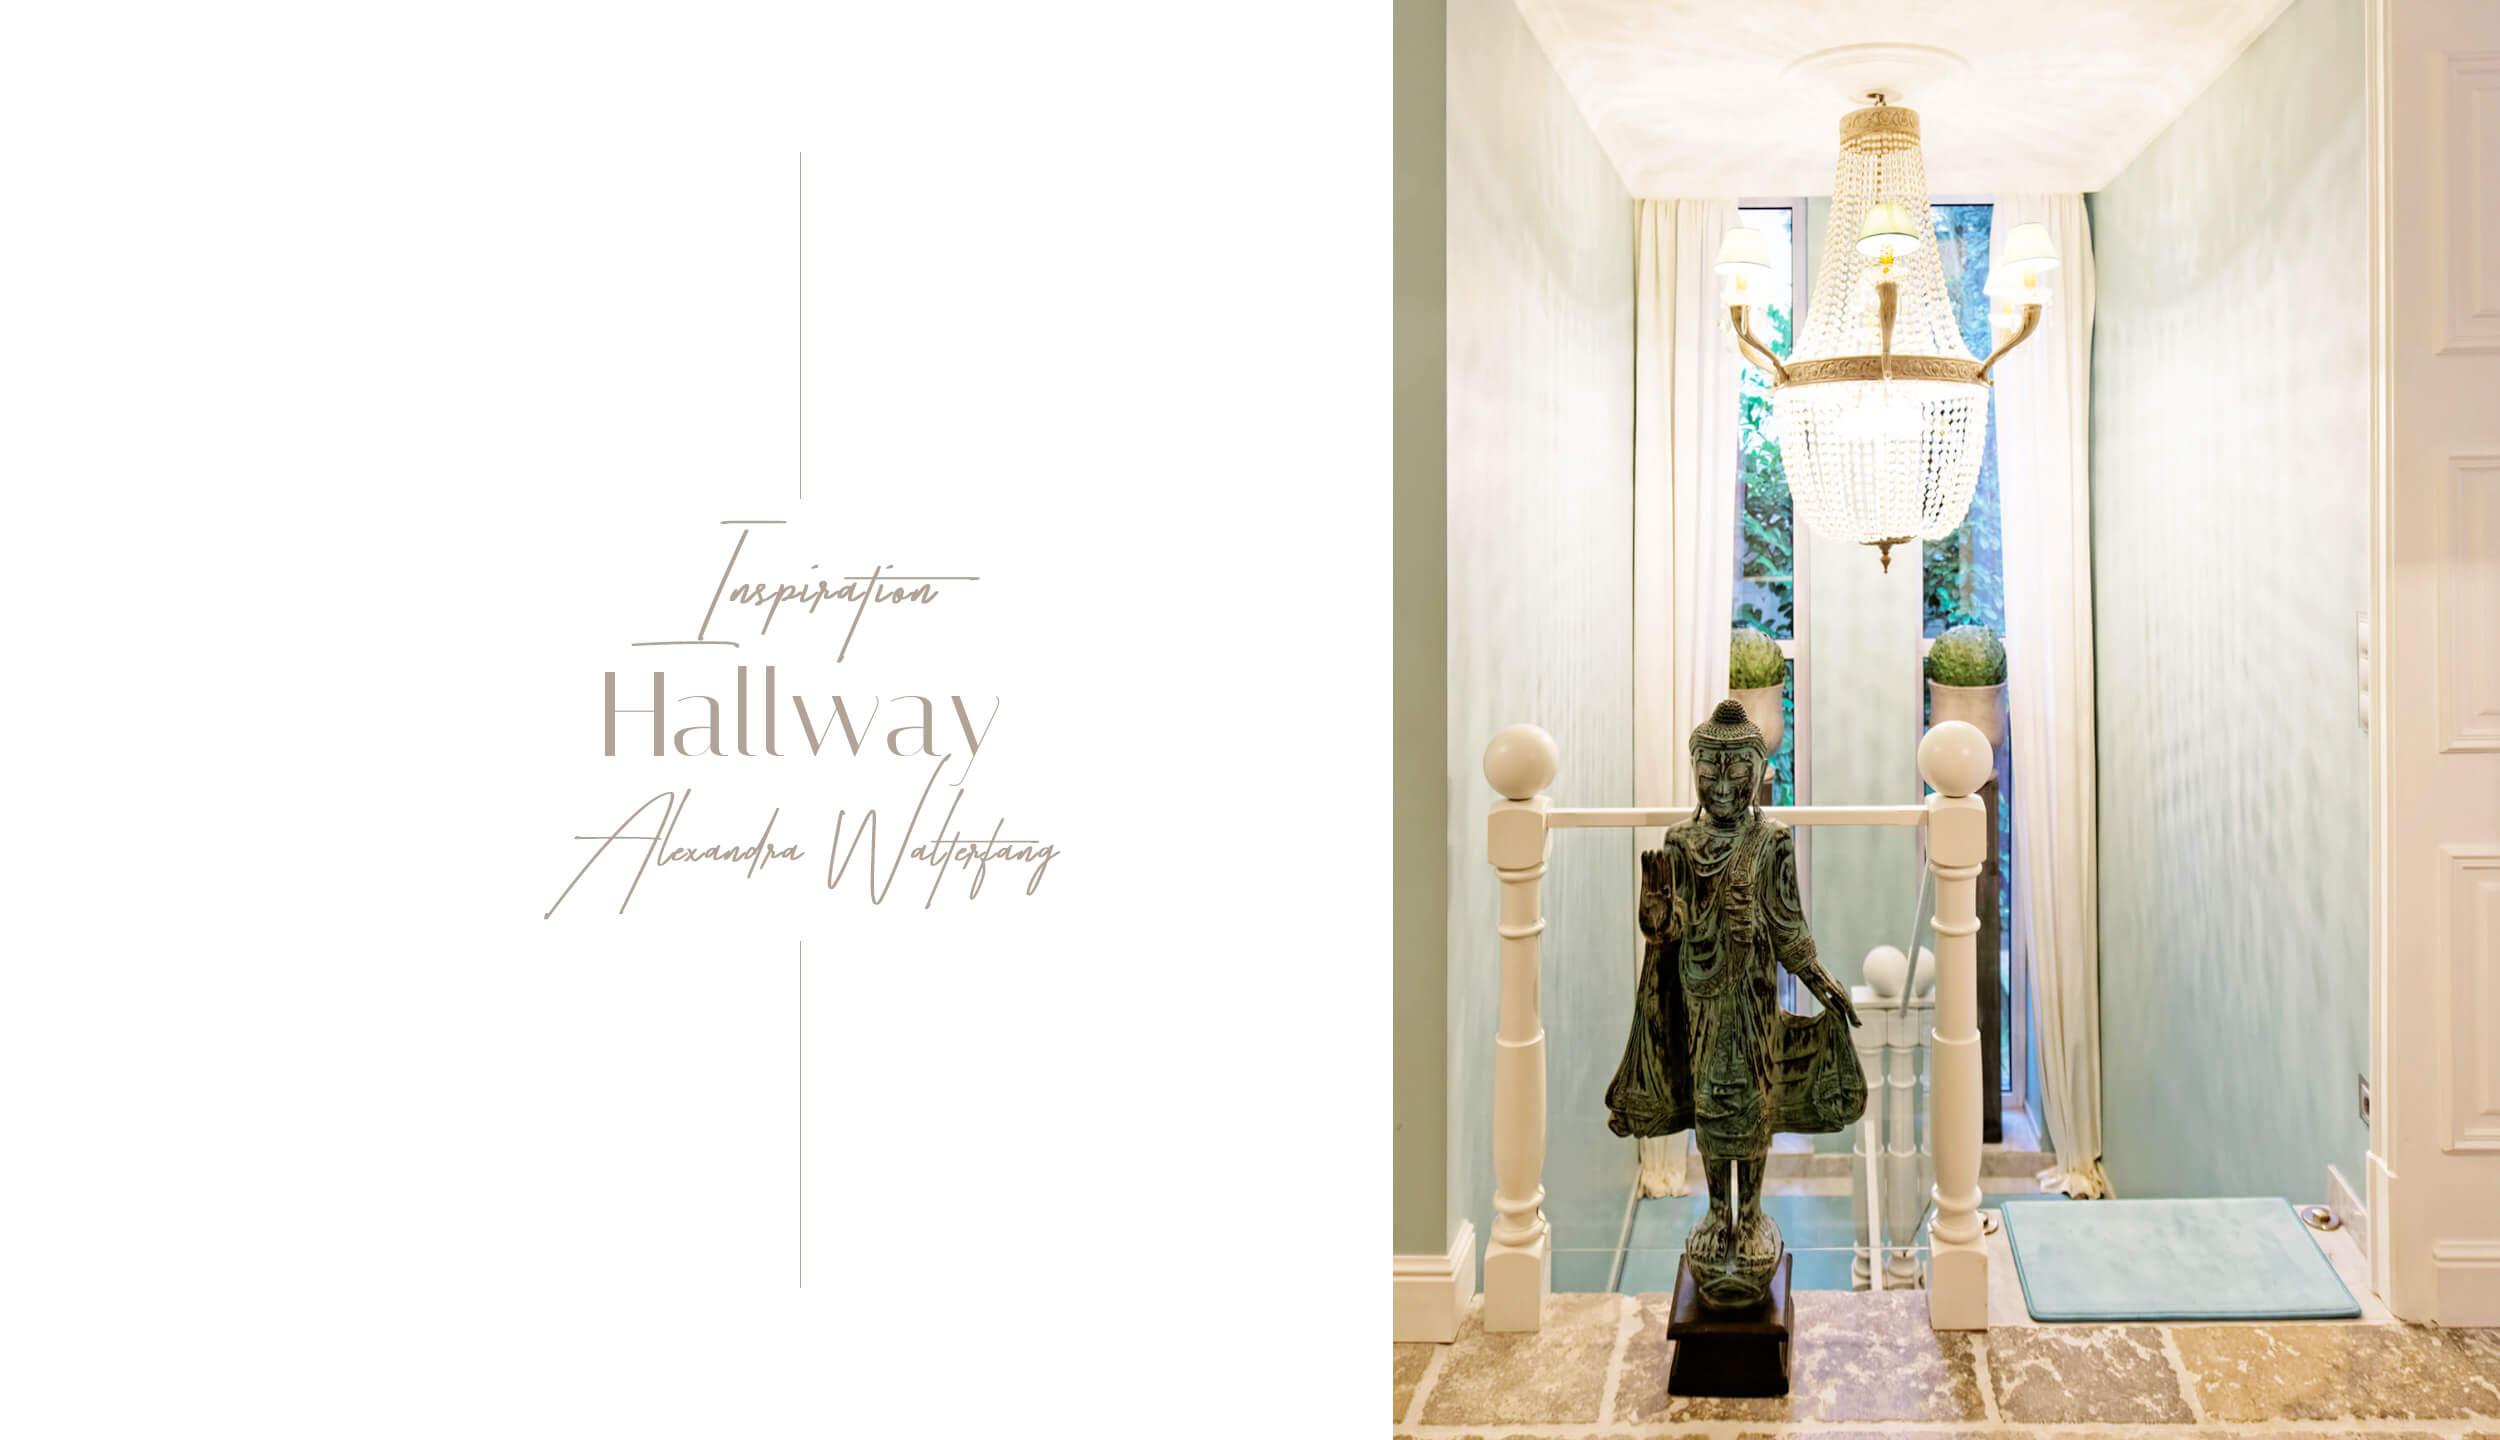 05b.Bruma immobilien Alexandra Walterfang Hallway  Inspiration.jpg